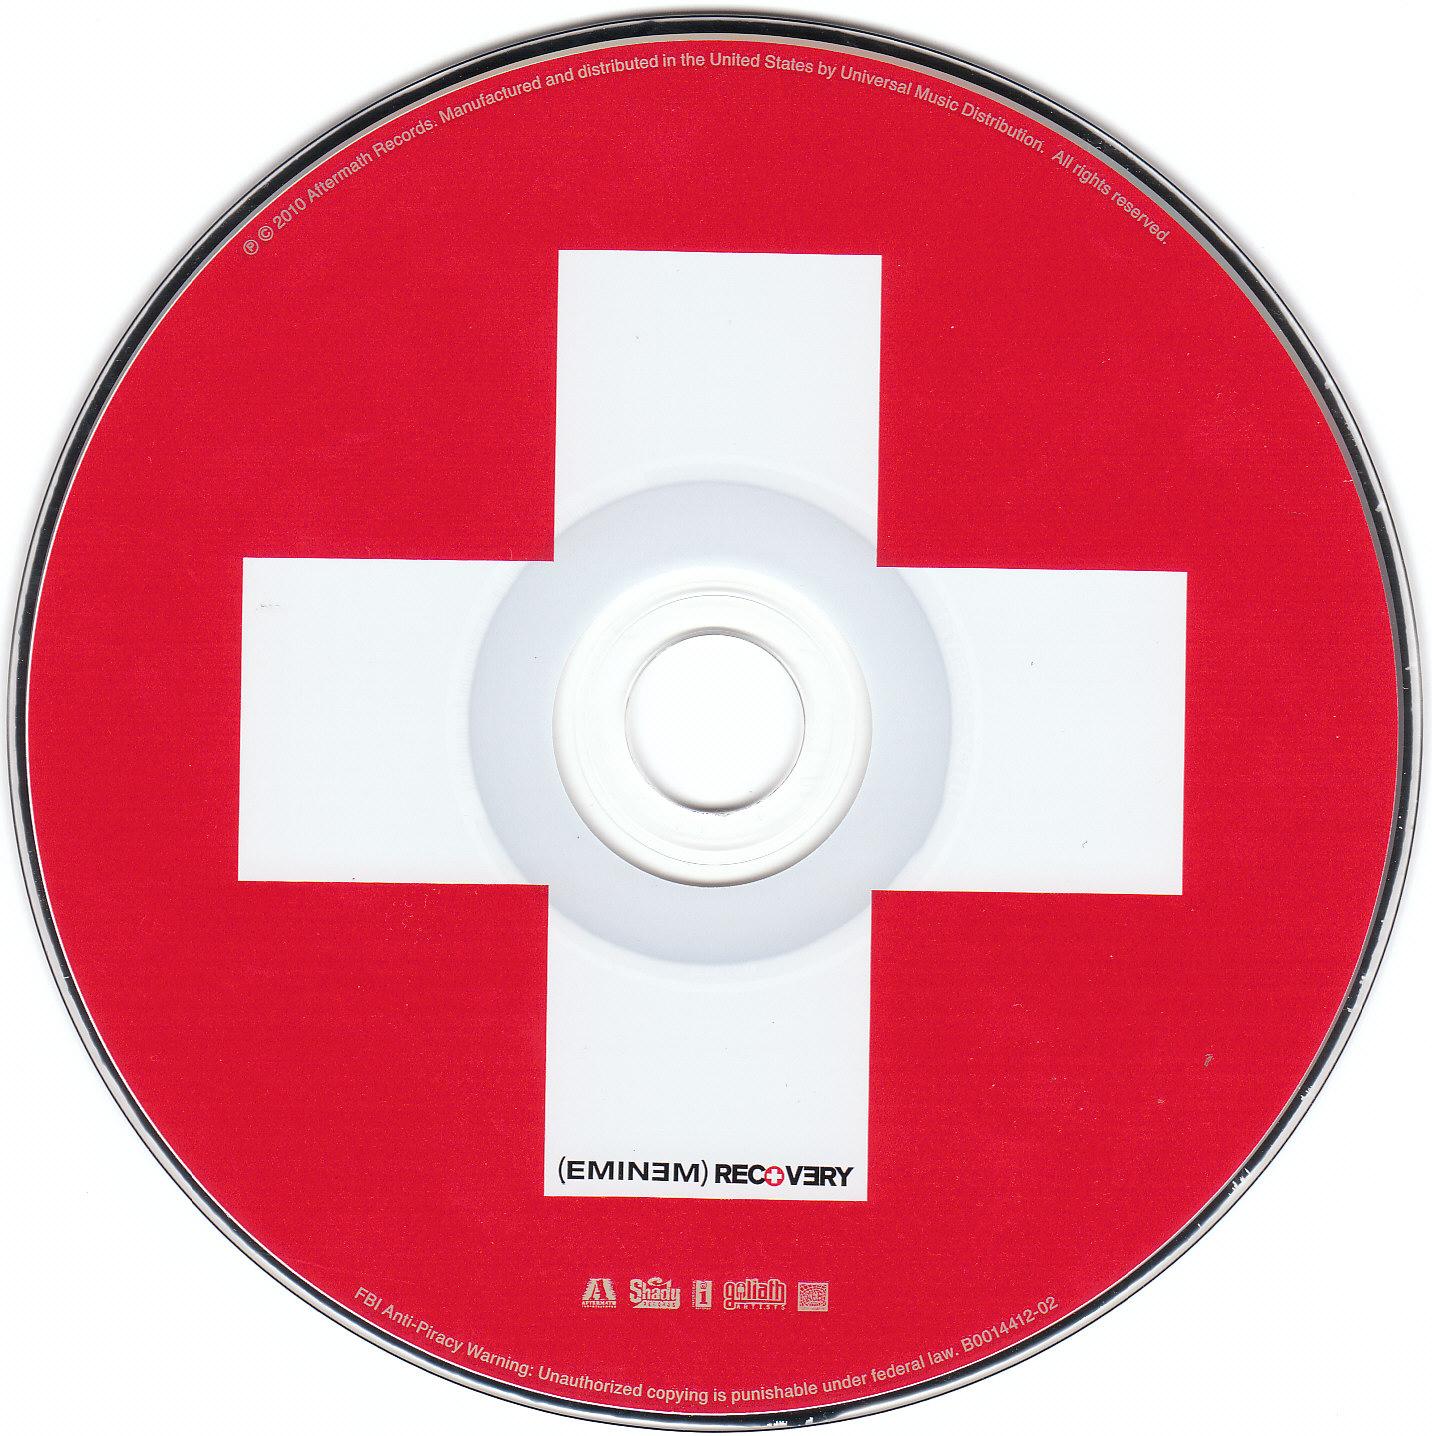 Eminem Recovery Bonus Tracks Snippets Hiphop N More